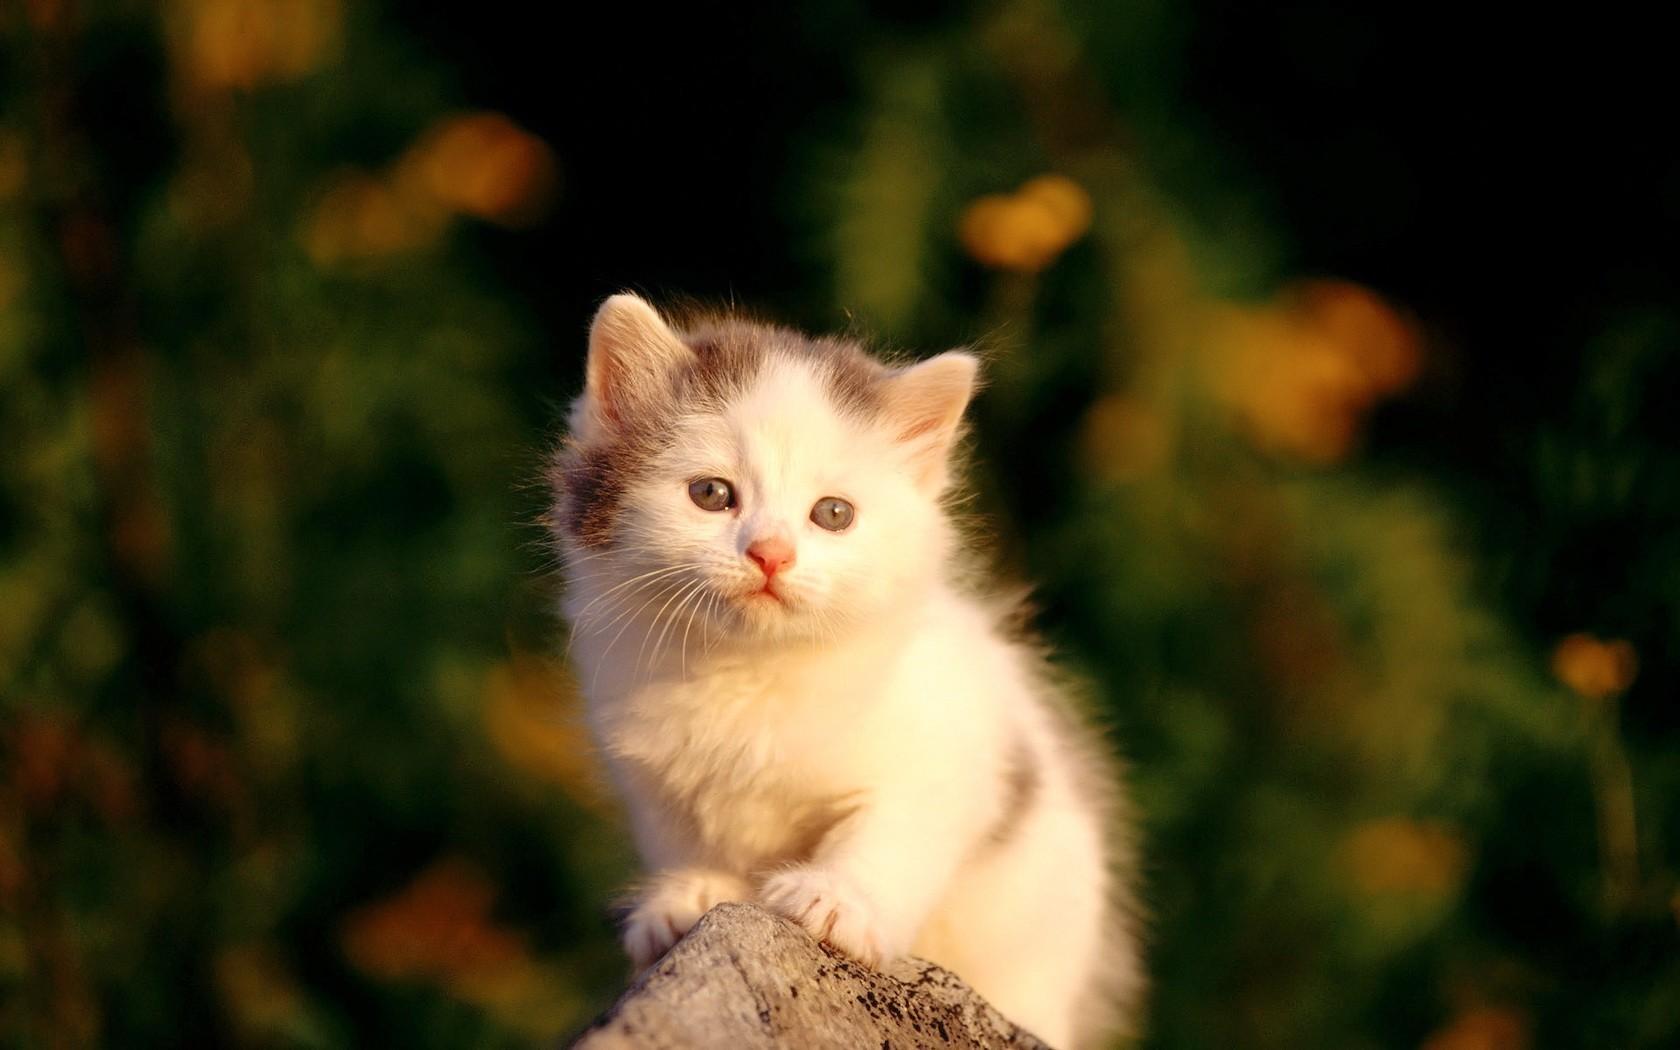 Картинка с милым котенком